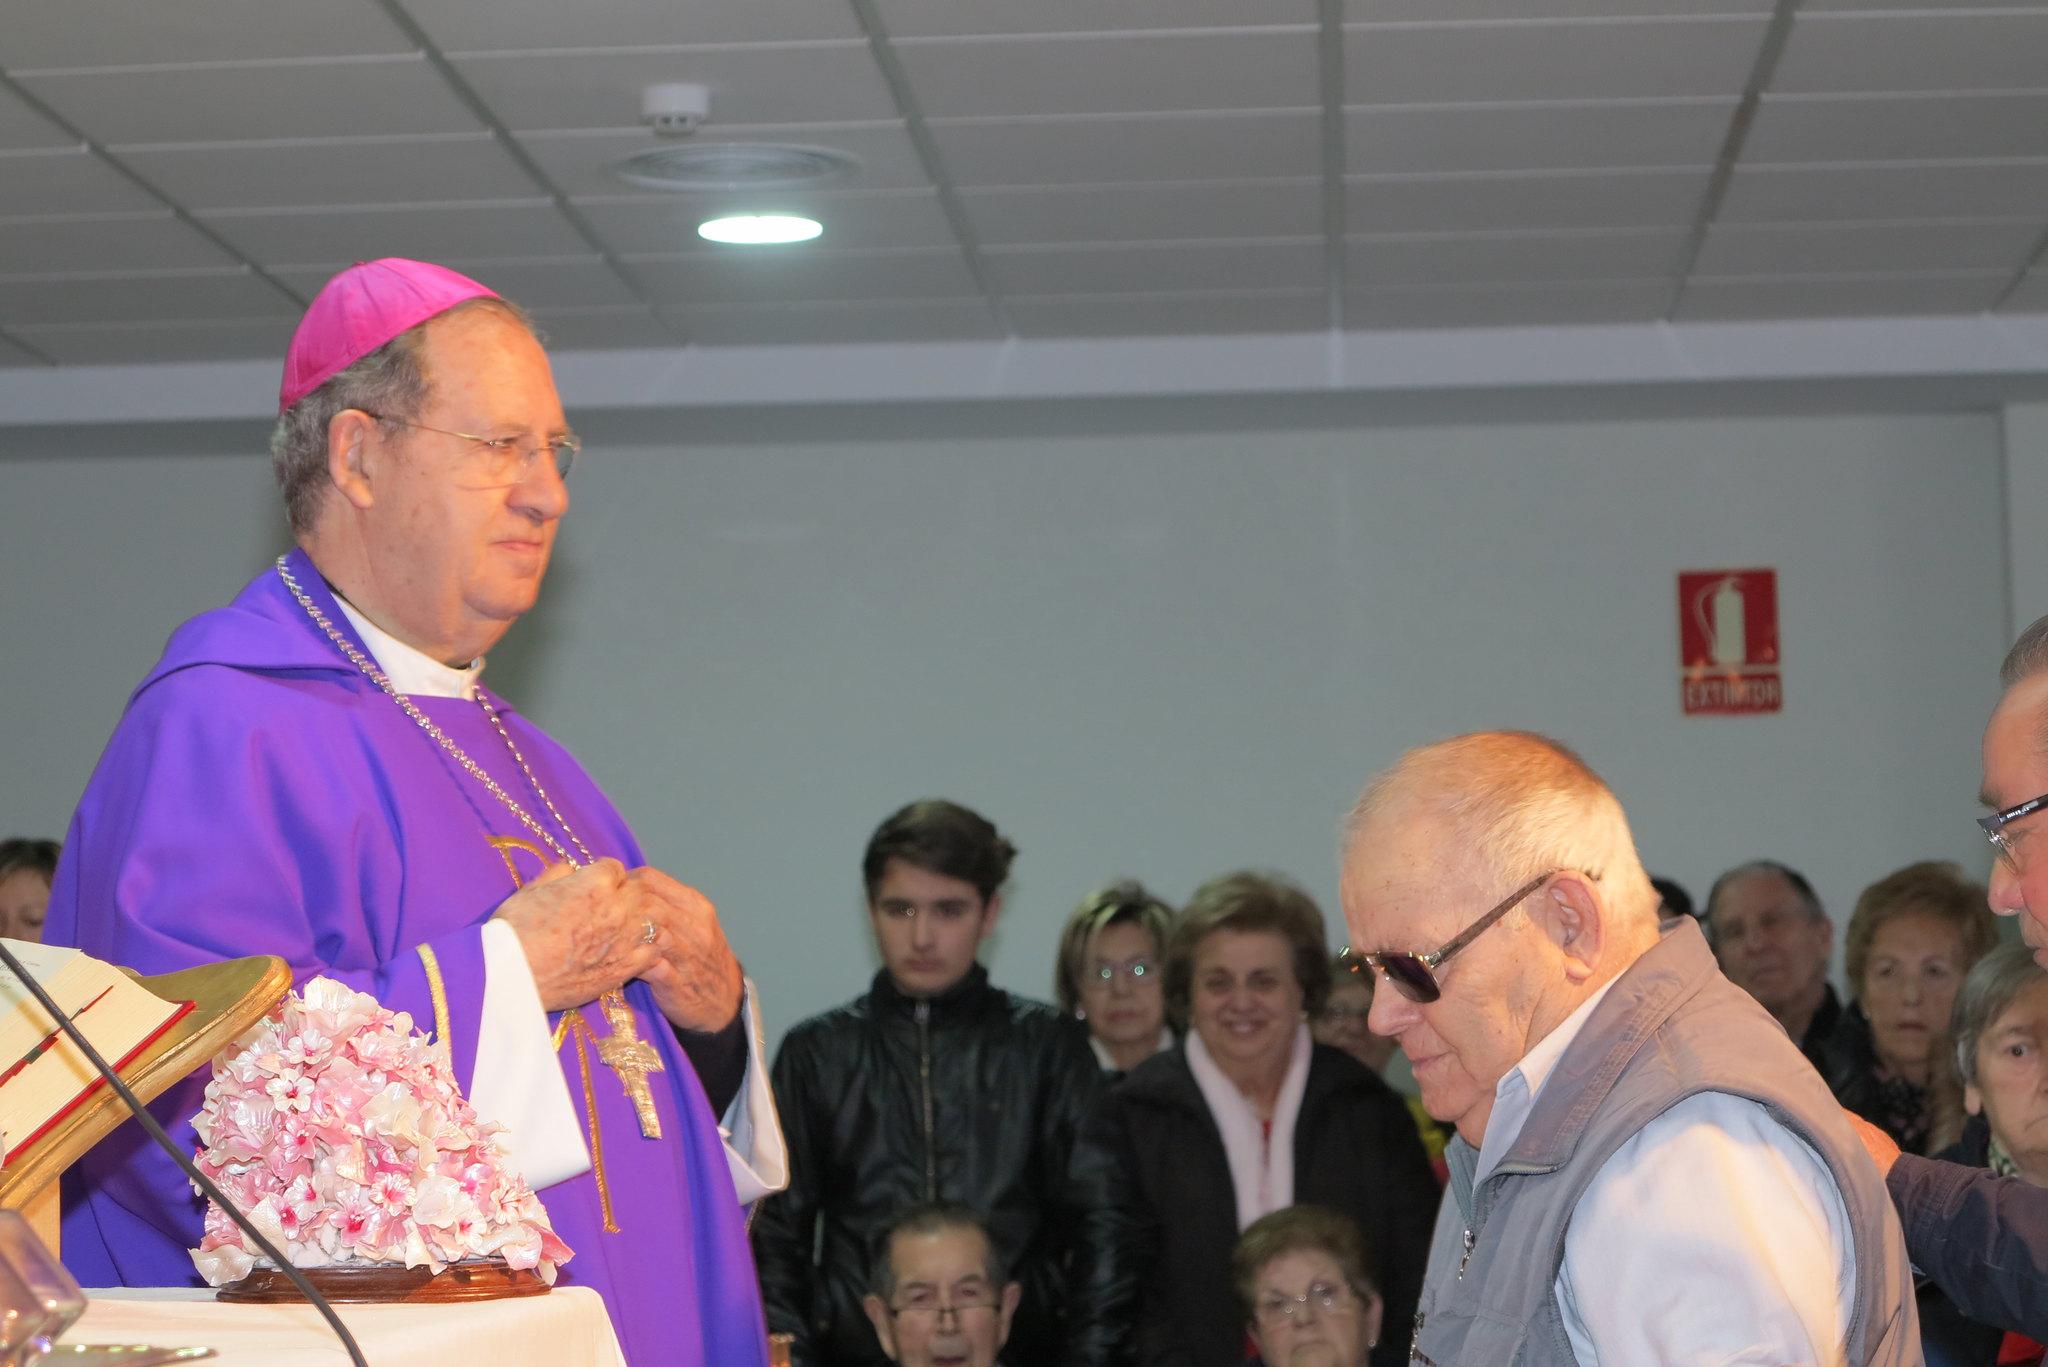 (2016-02-13) - Inauguración Virgen de Lourdes, La Molineta - Archivo La Molineta 2 (22)